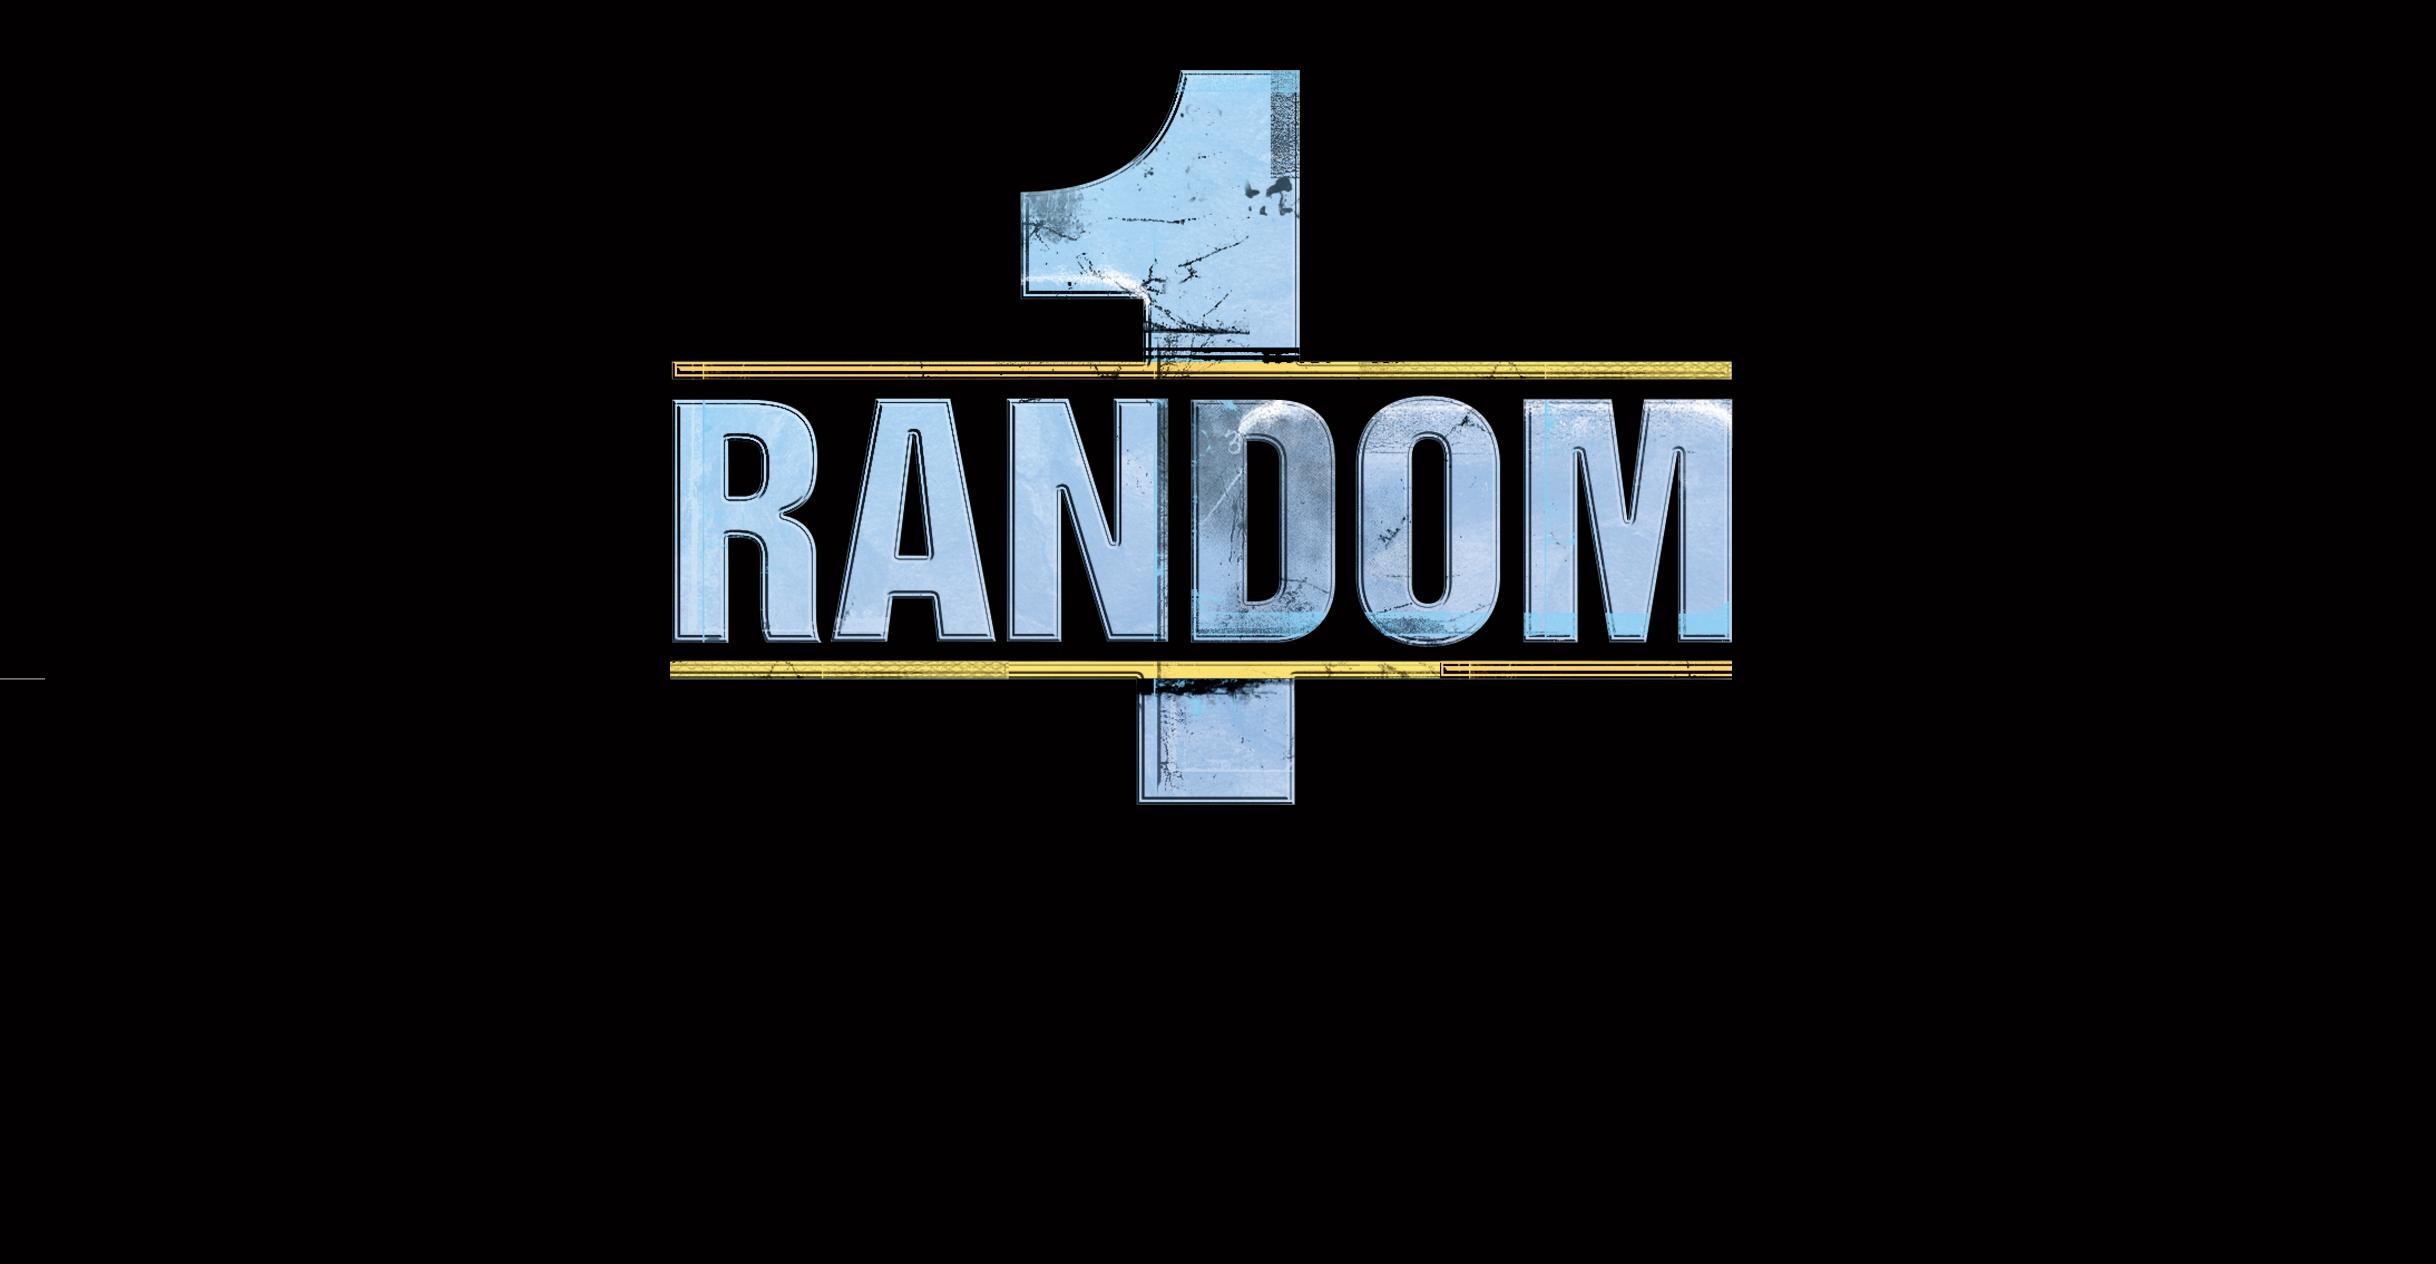 Random 1 [TV Series]